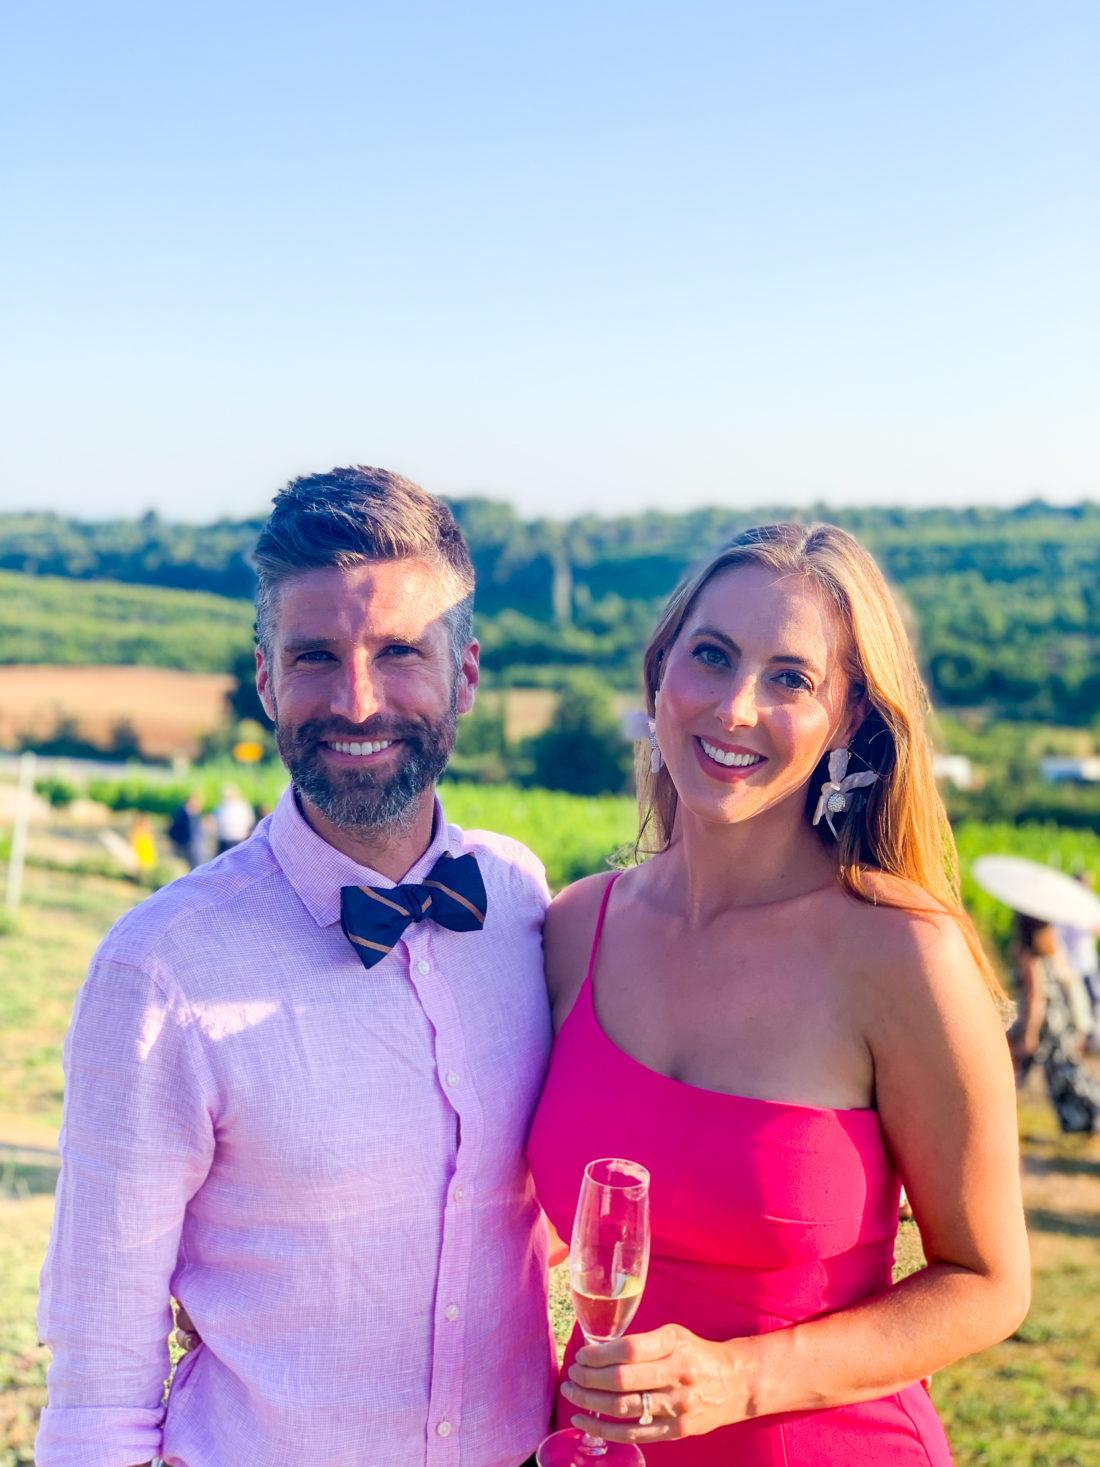 Eva Amurri Martino and husband Kyle at a wedding in Croatia